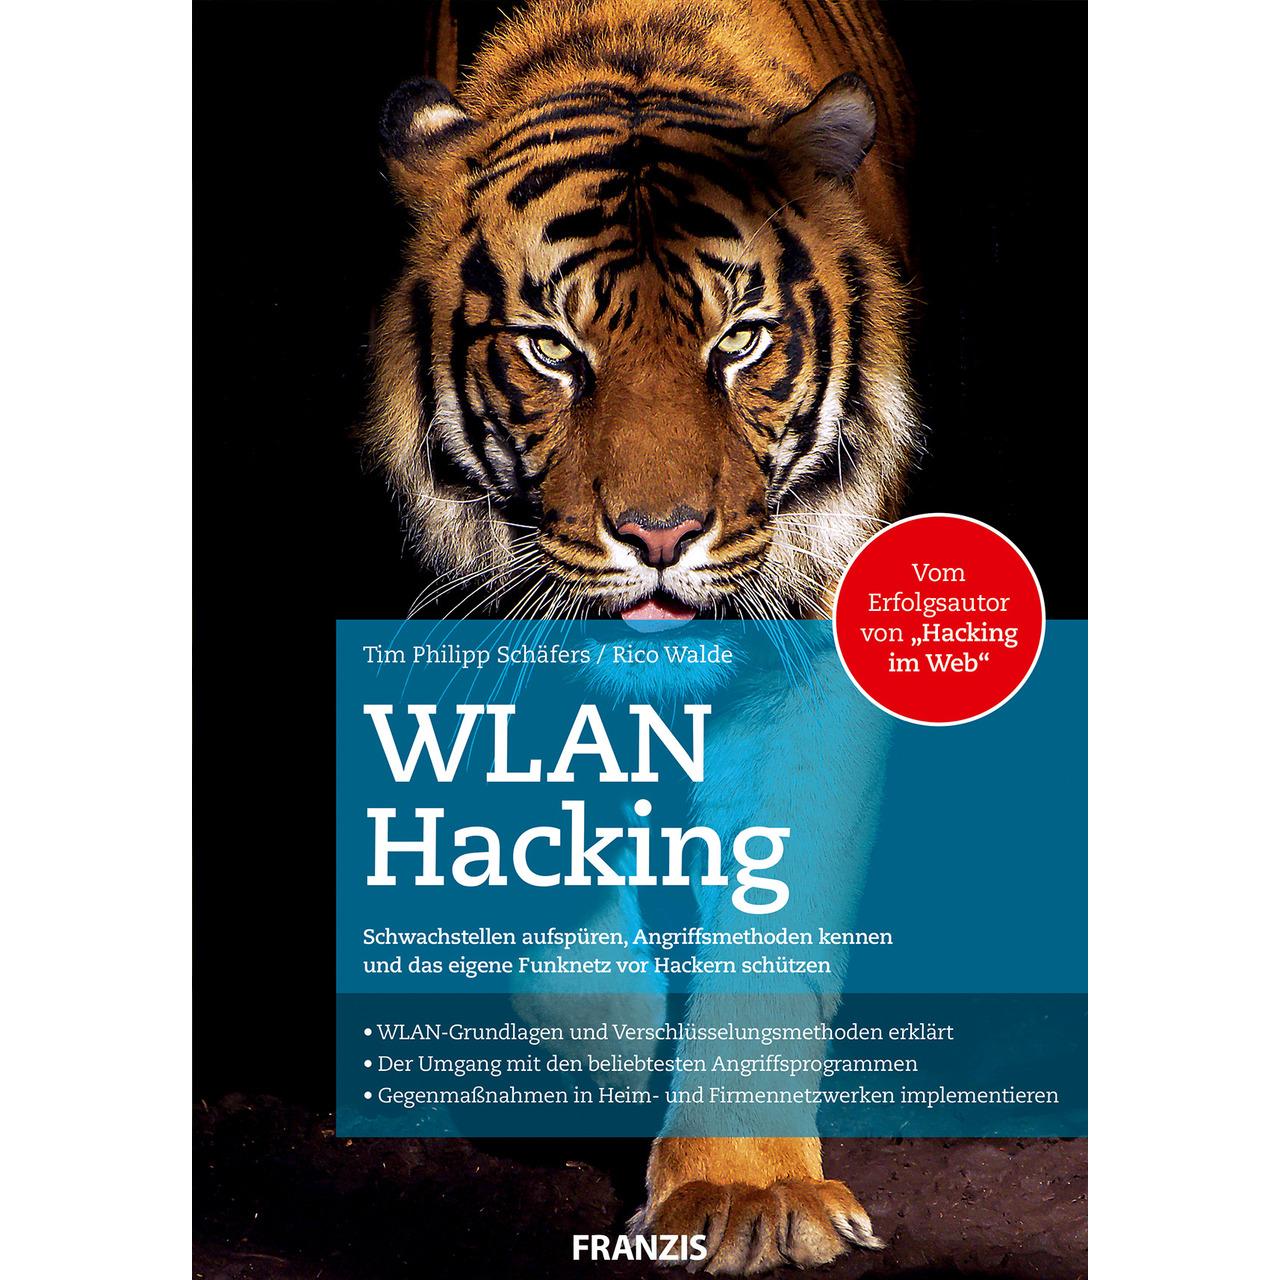 FRANZIS Fachbuch WLAN-Hacking- 512 Seiten